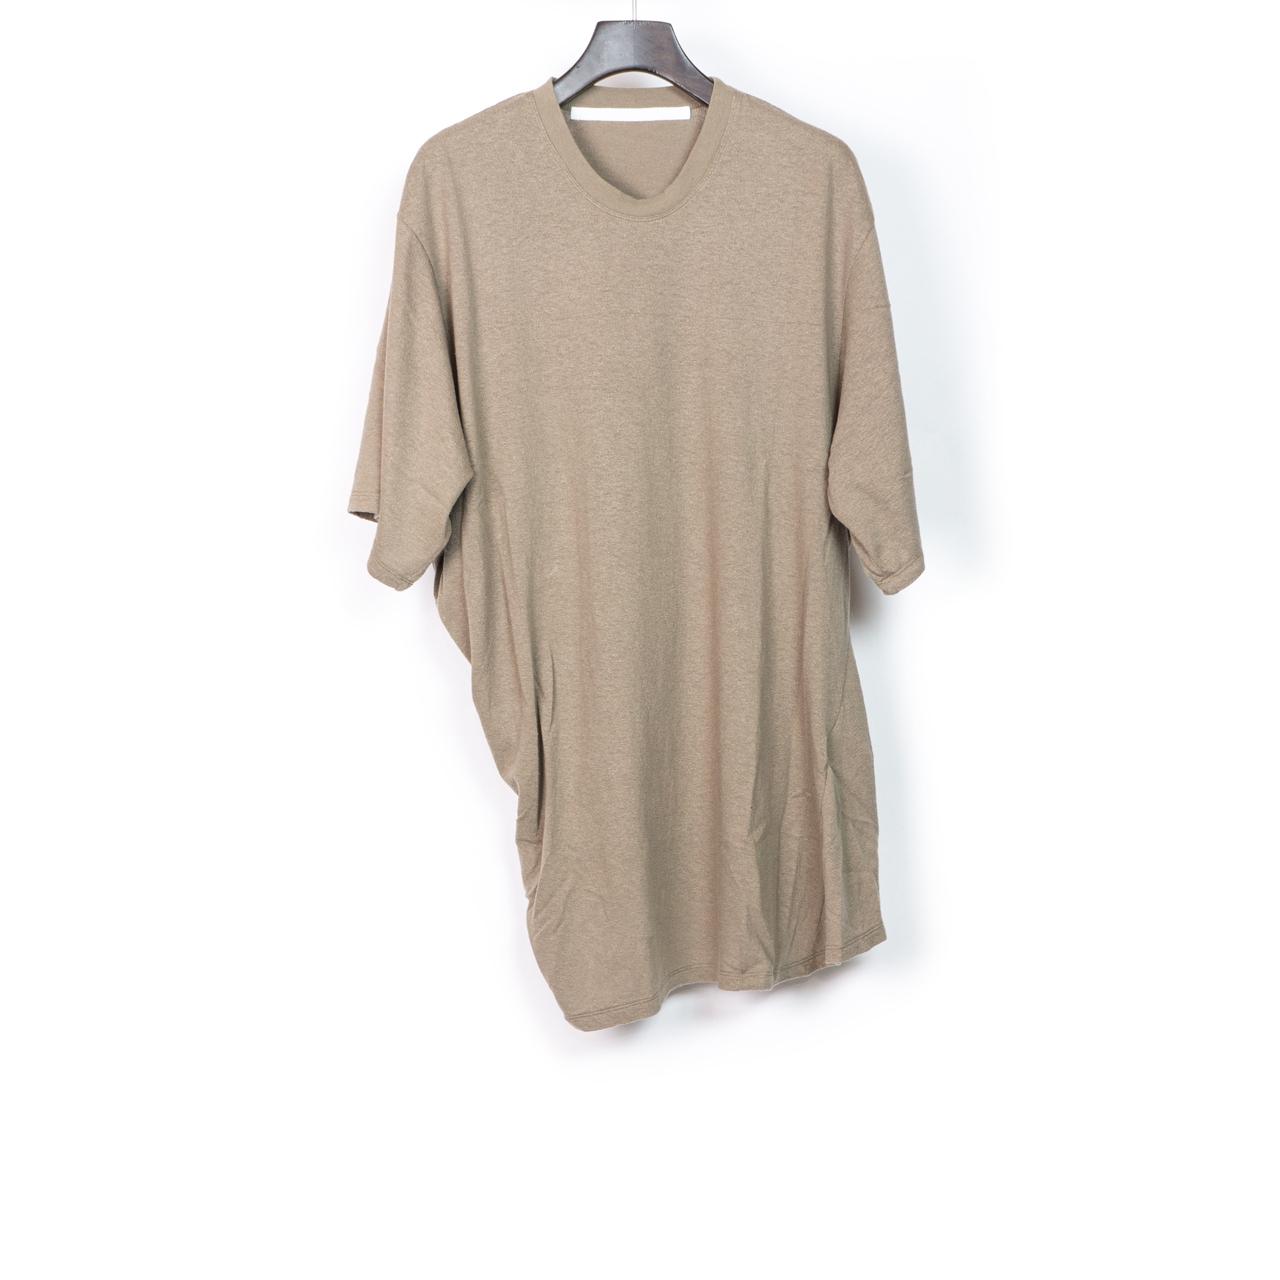 697CUM10-SAND / サイドドレープ Tシャツ